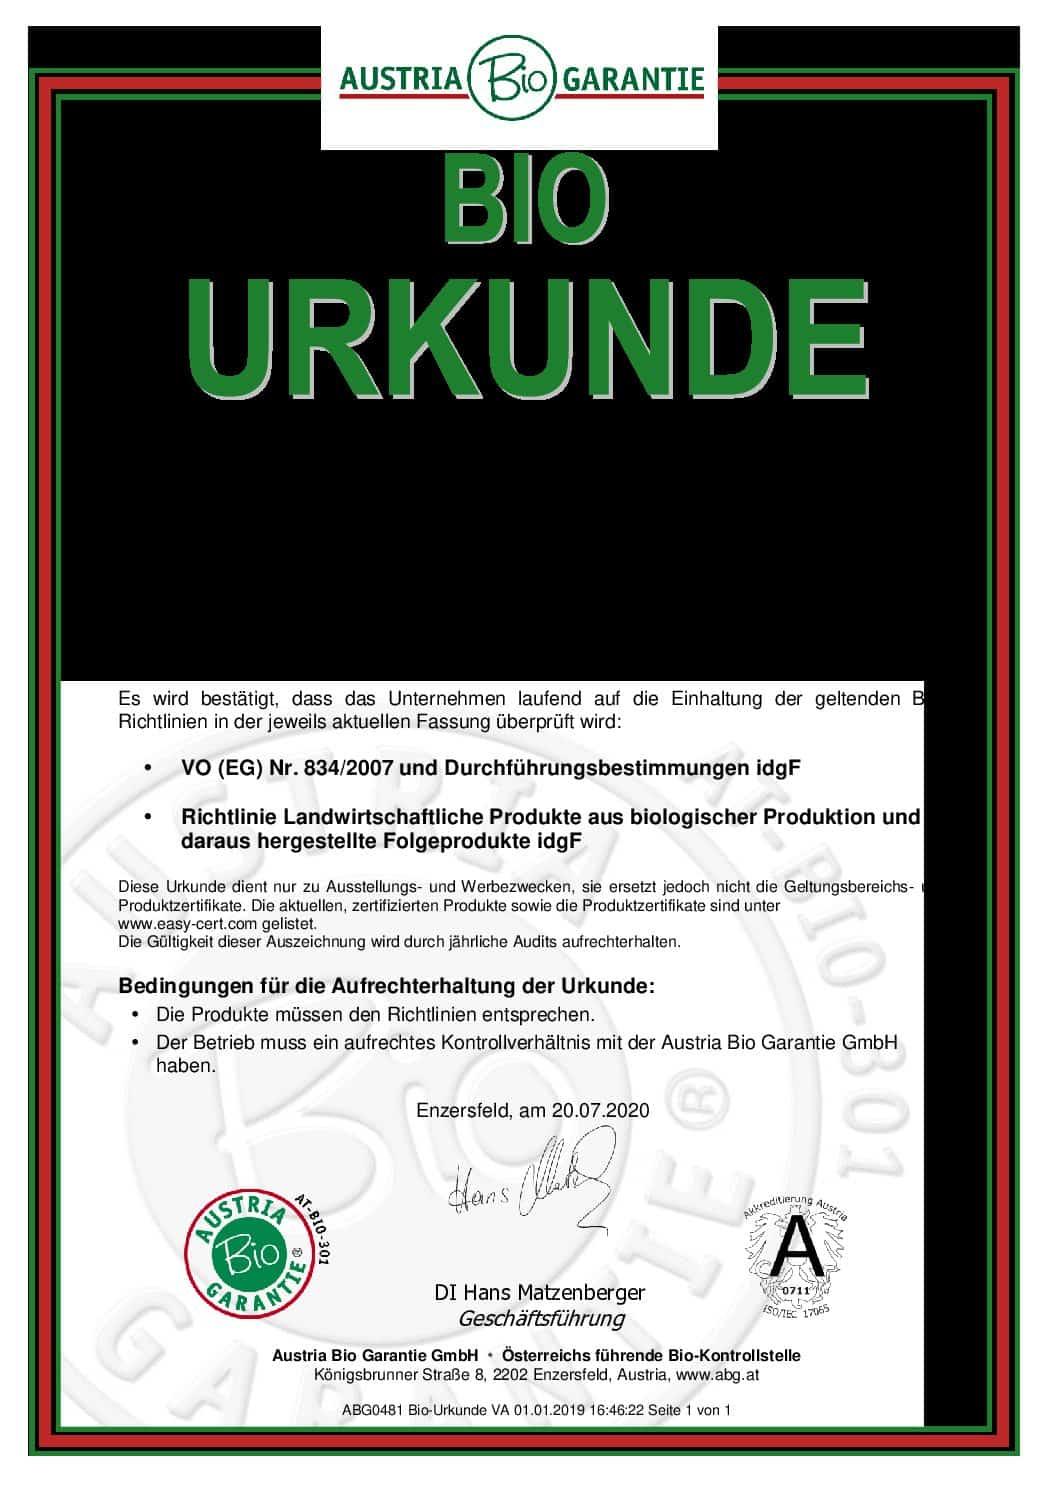 cbd магазин - bio austria garantie urkunde pdf